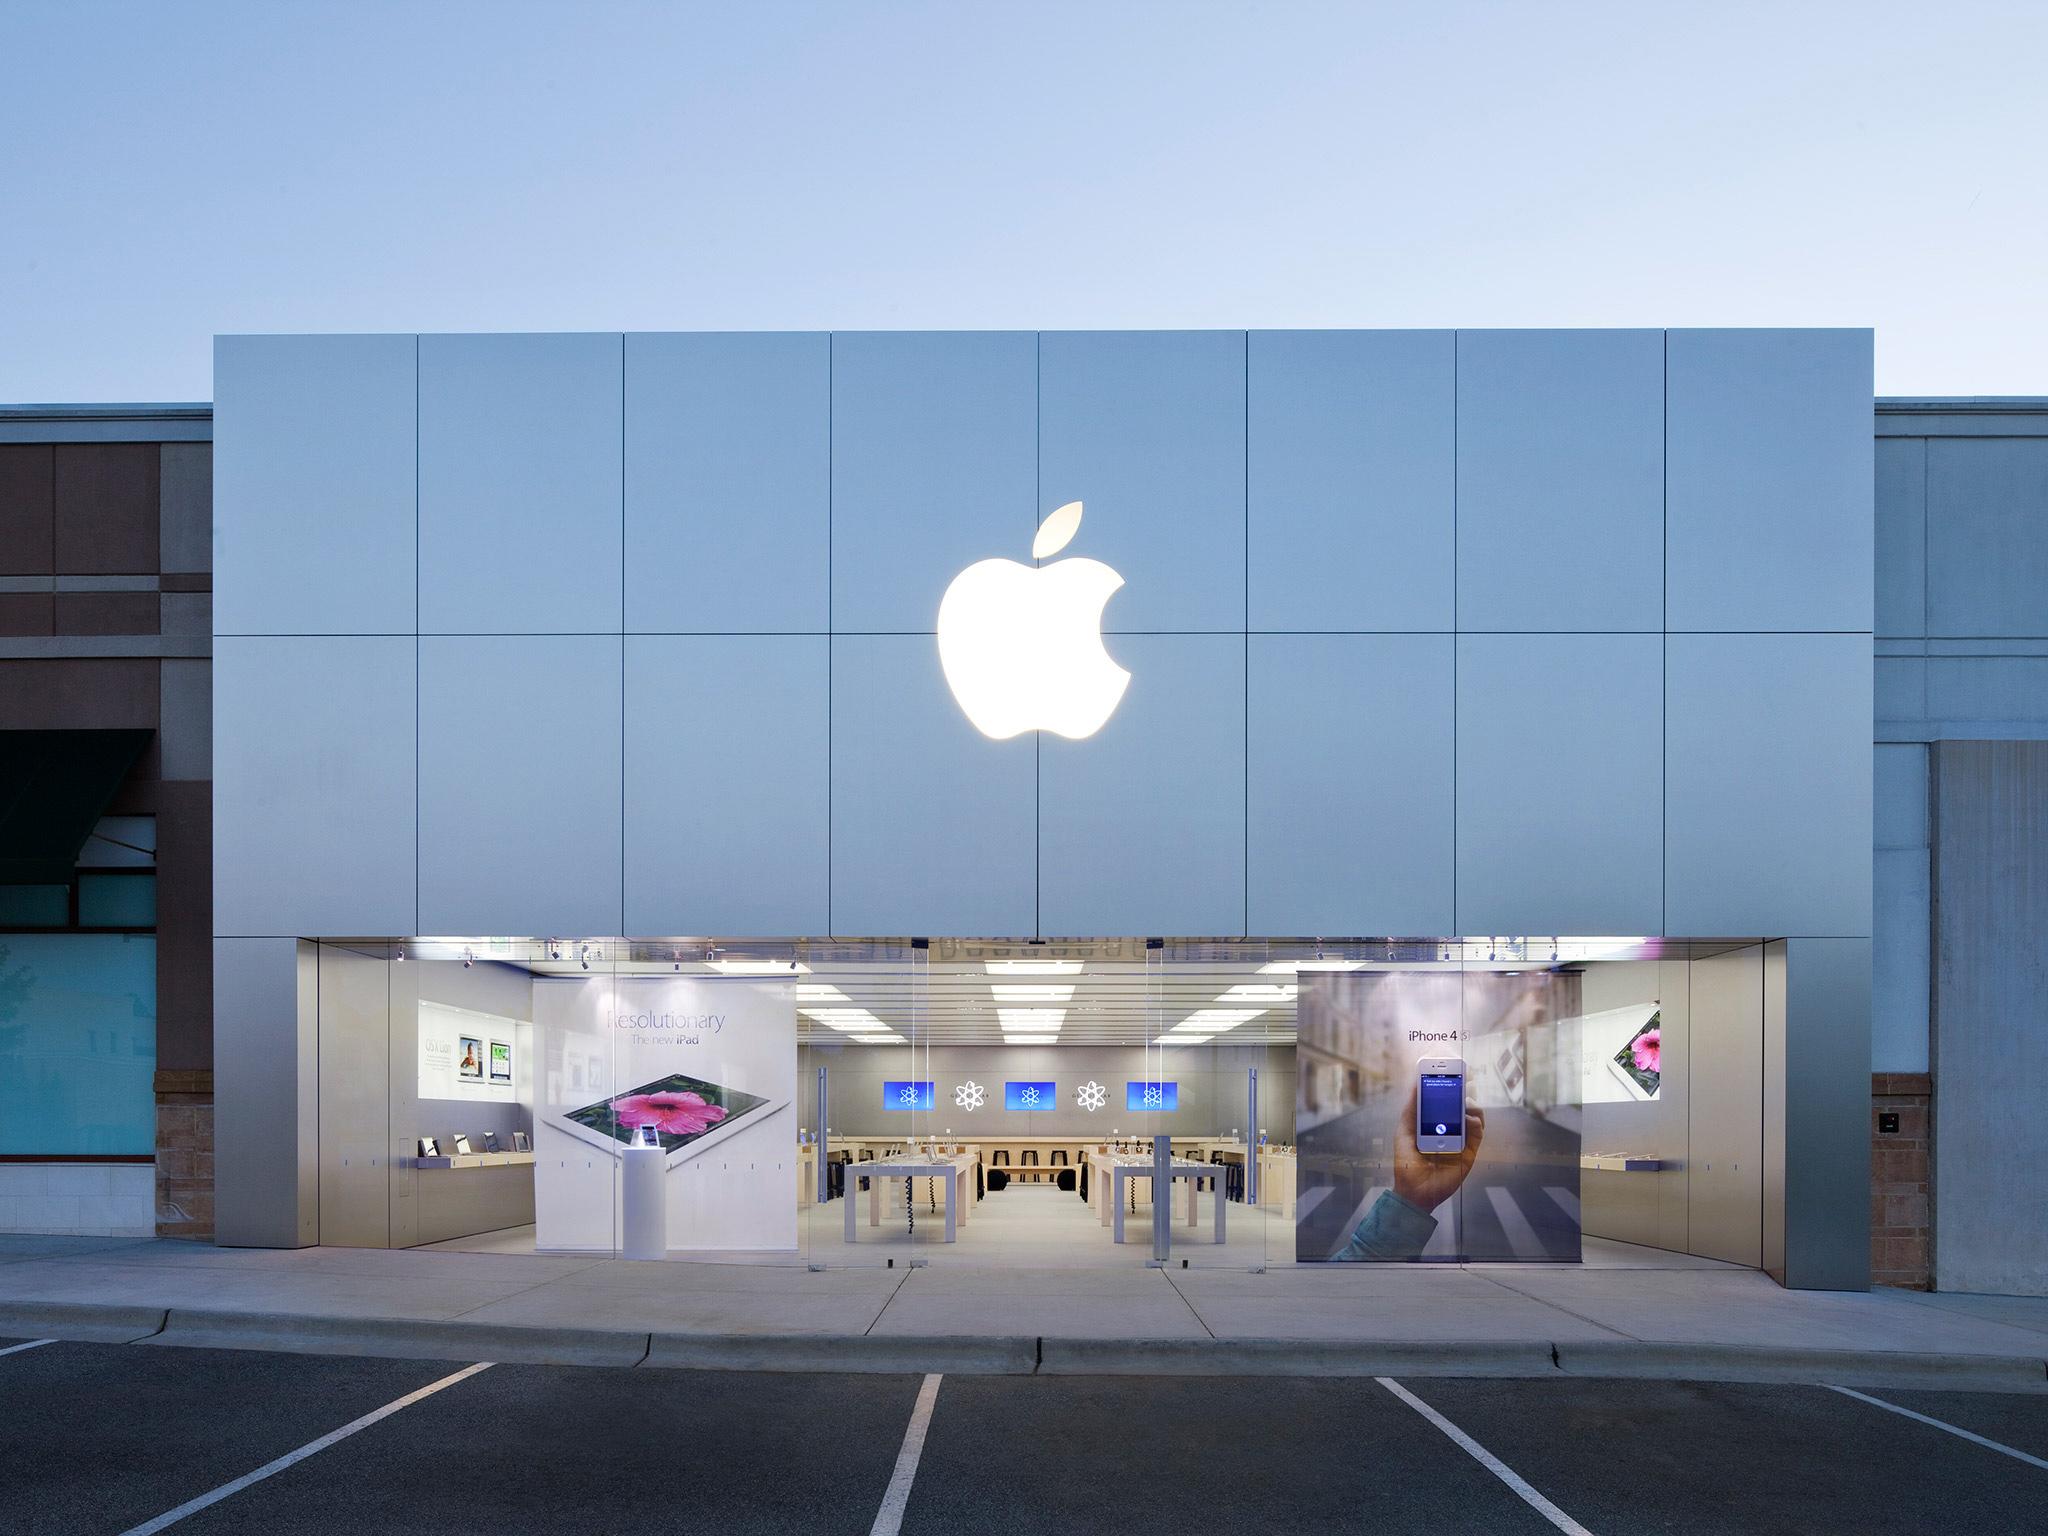 Apple Friendly Center